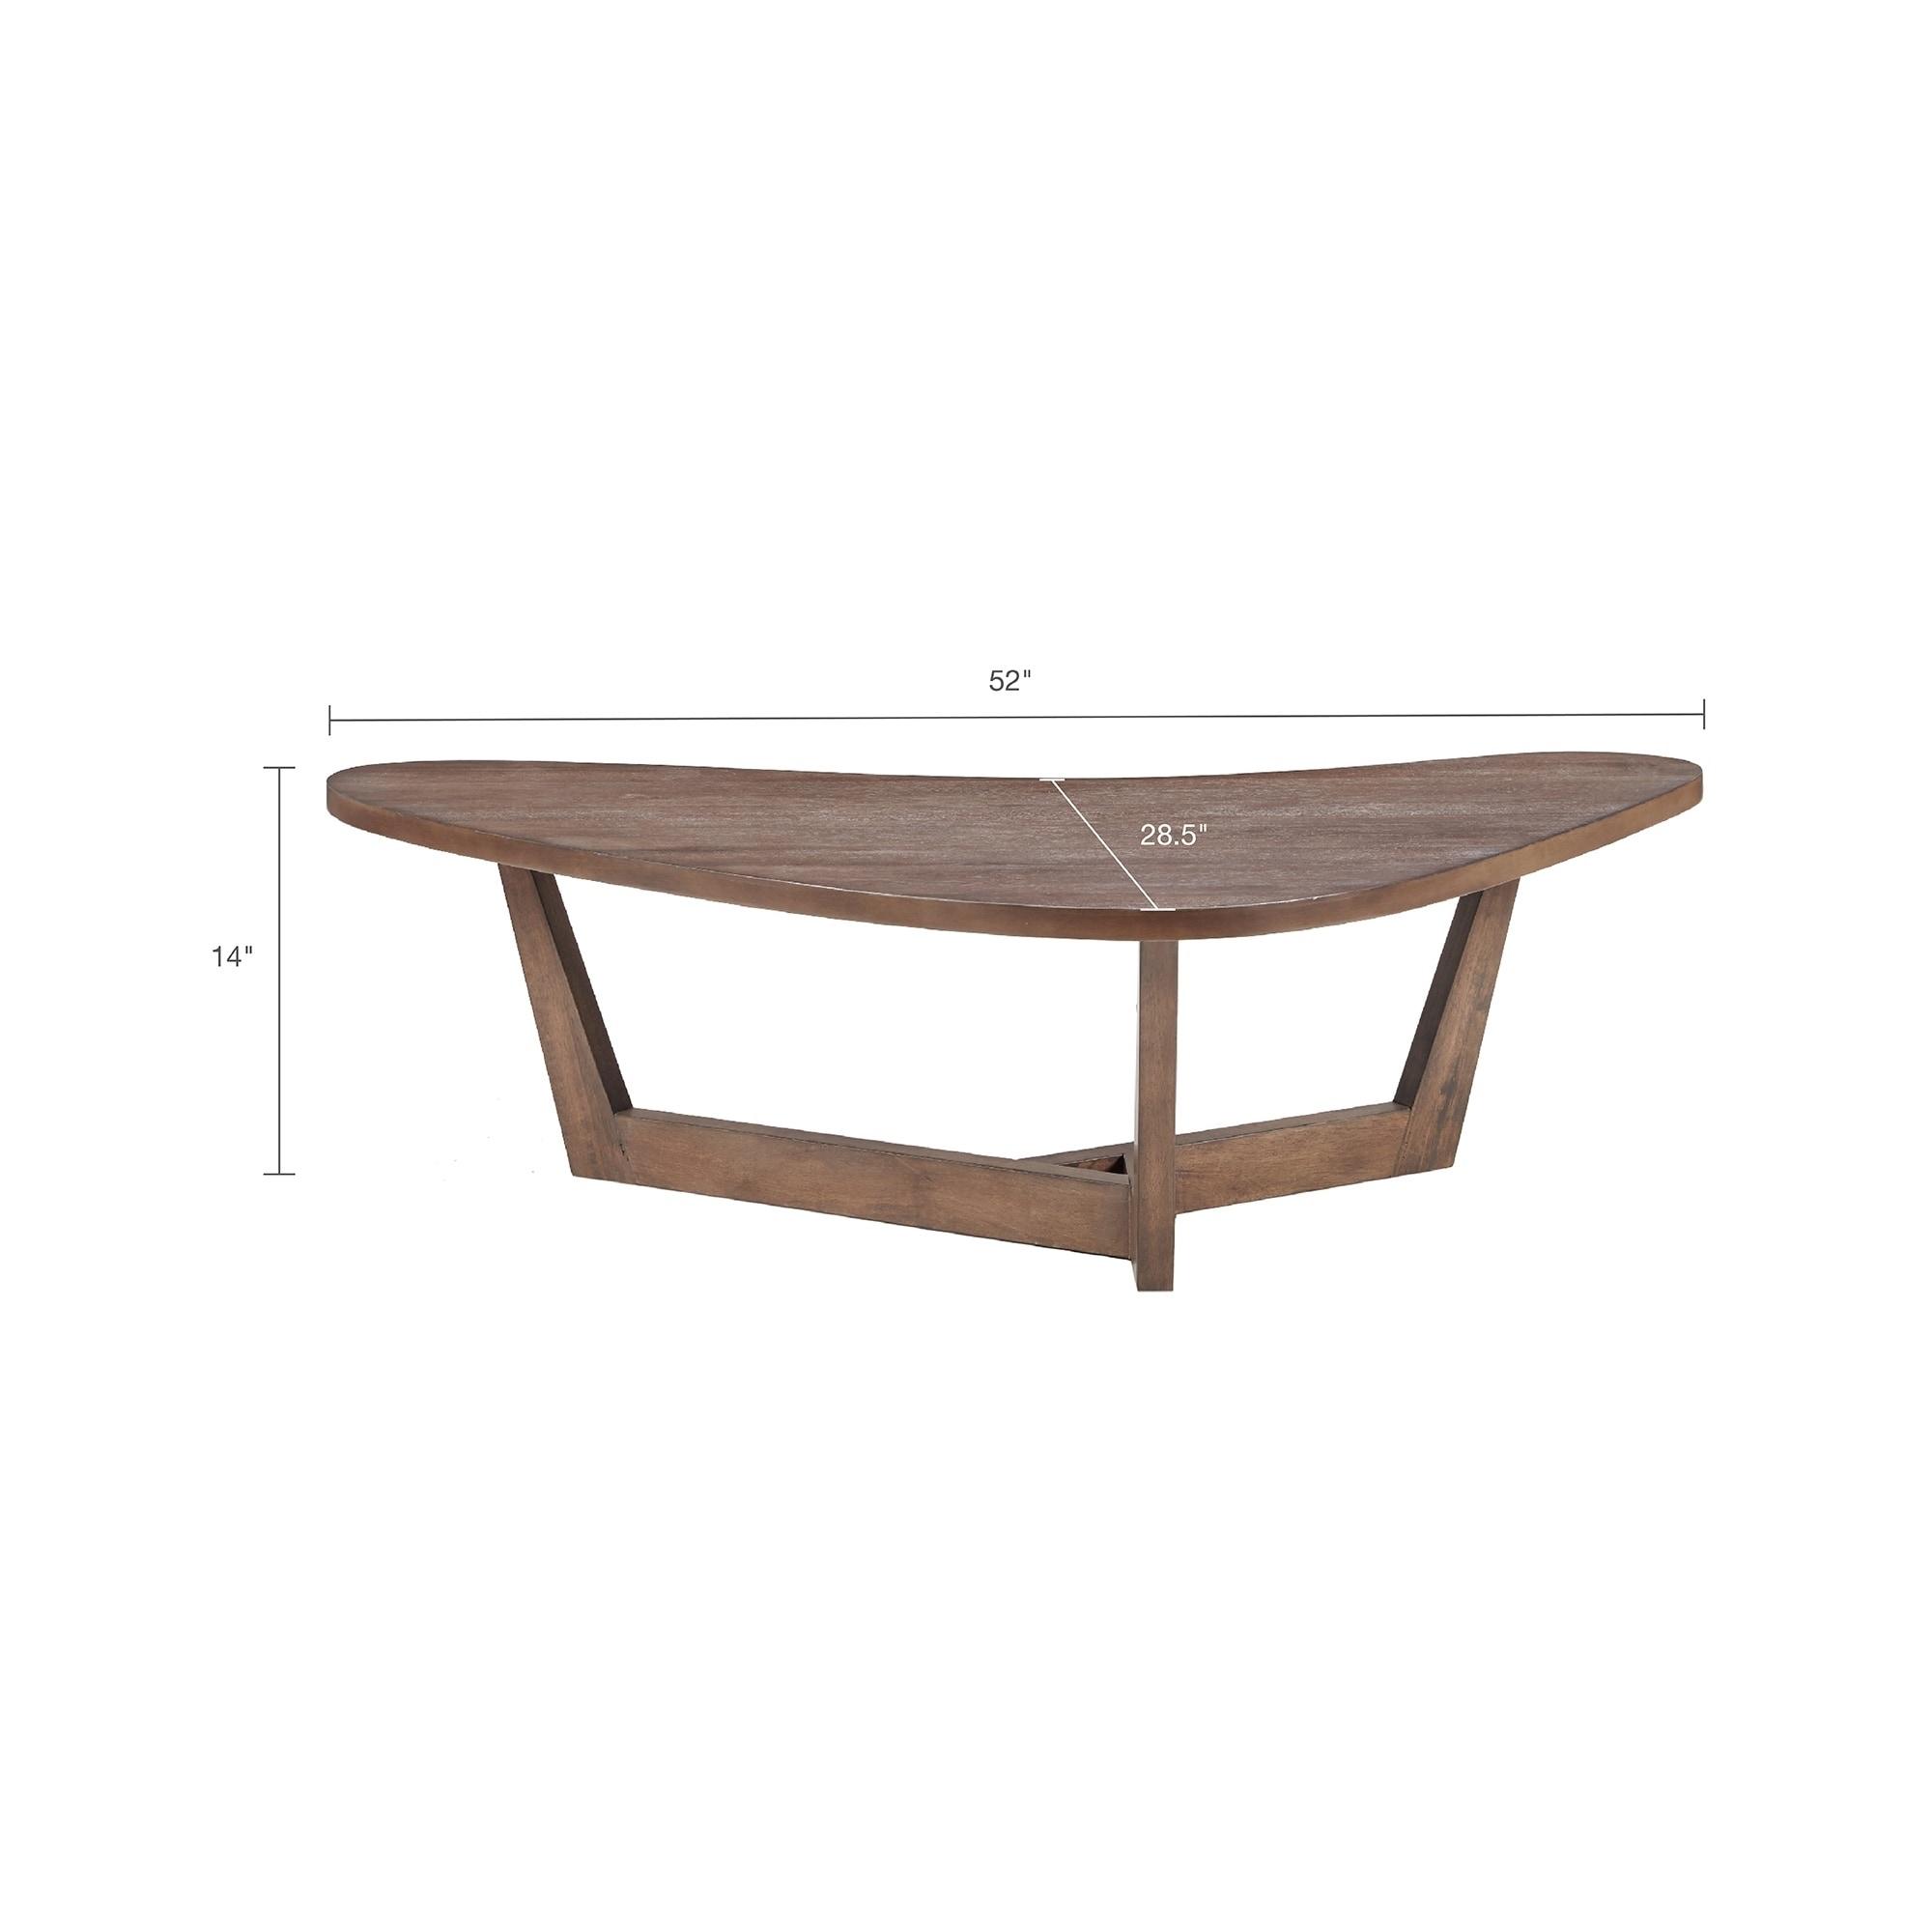 Rubberwood Coffee Table.Ink Ivy Boomerang Brown Acacia Veneer Rubberwood Coffee Table